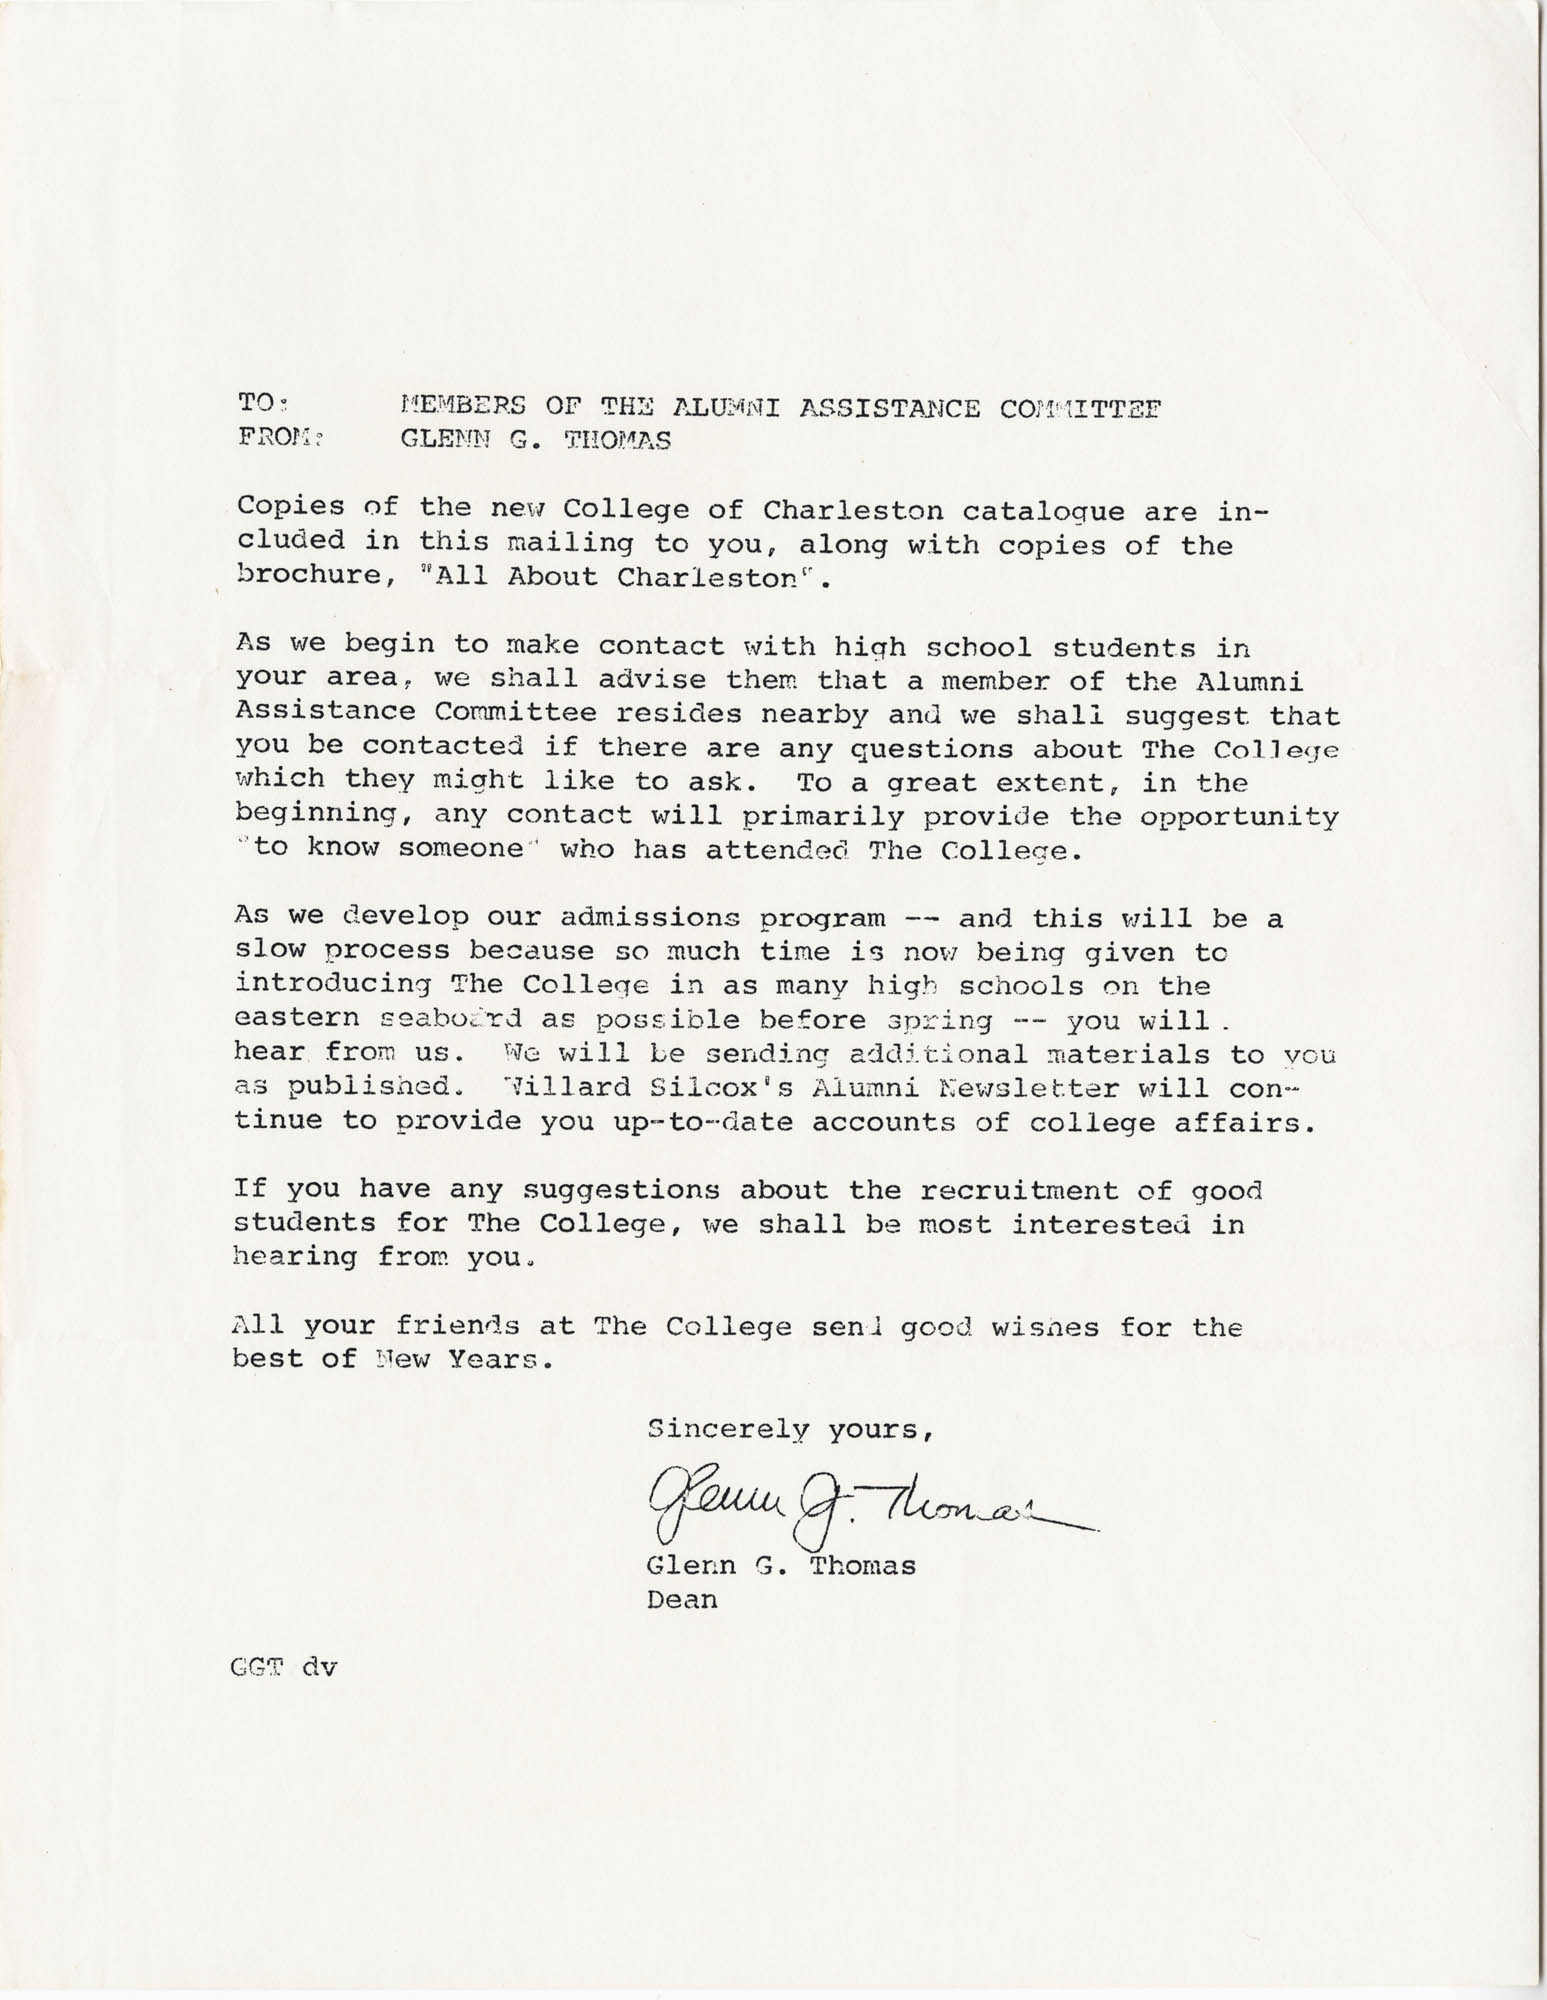 Letter from Glenn G. Thomas, undated